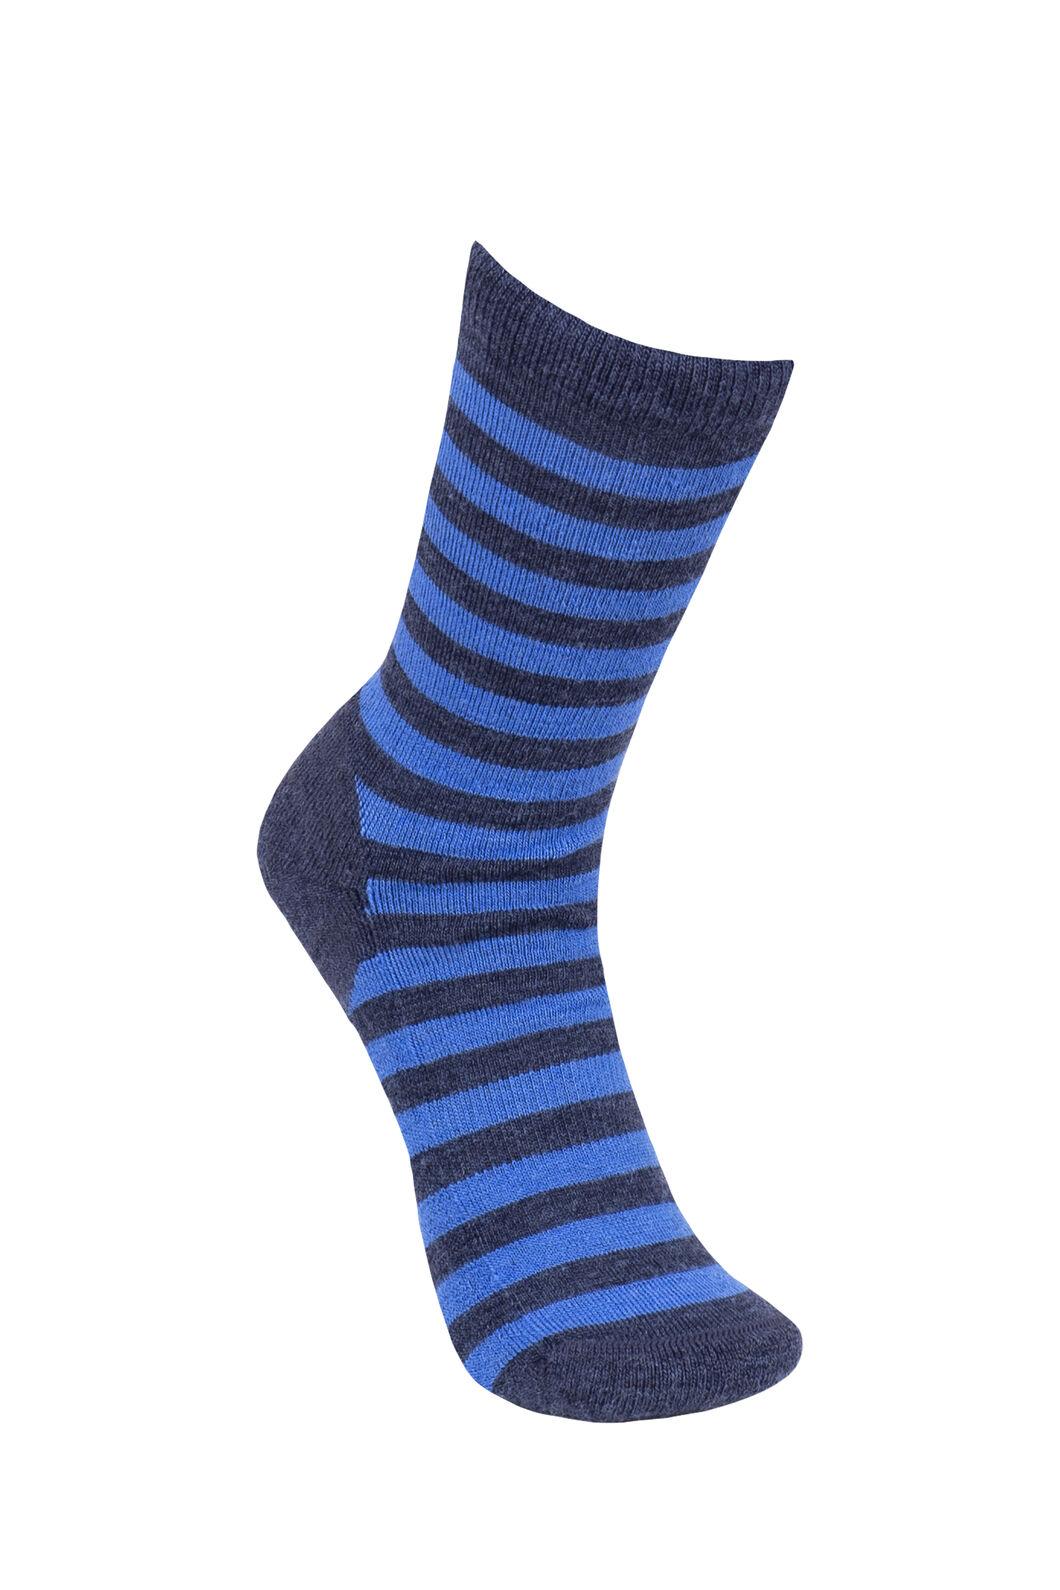 Macpac Footprint Socks Kids', Skydiver/Black Iris, hi-res